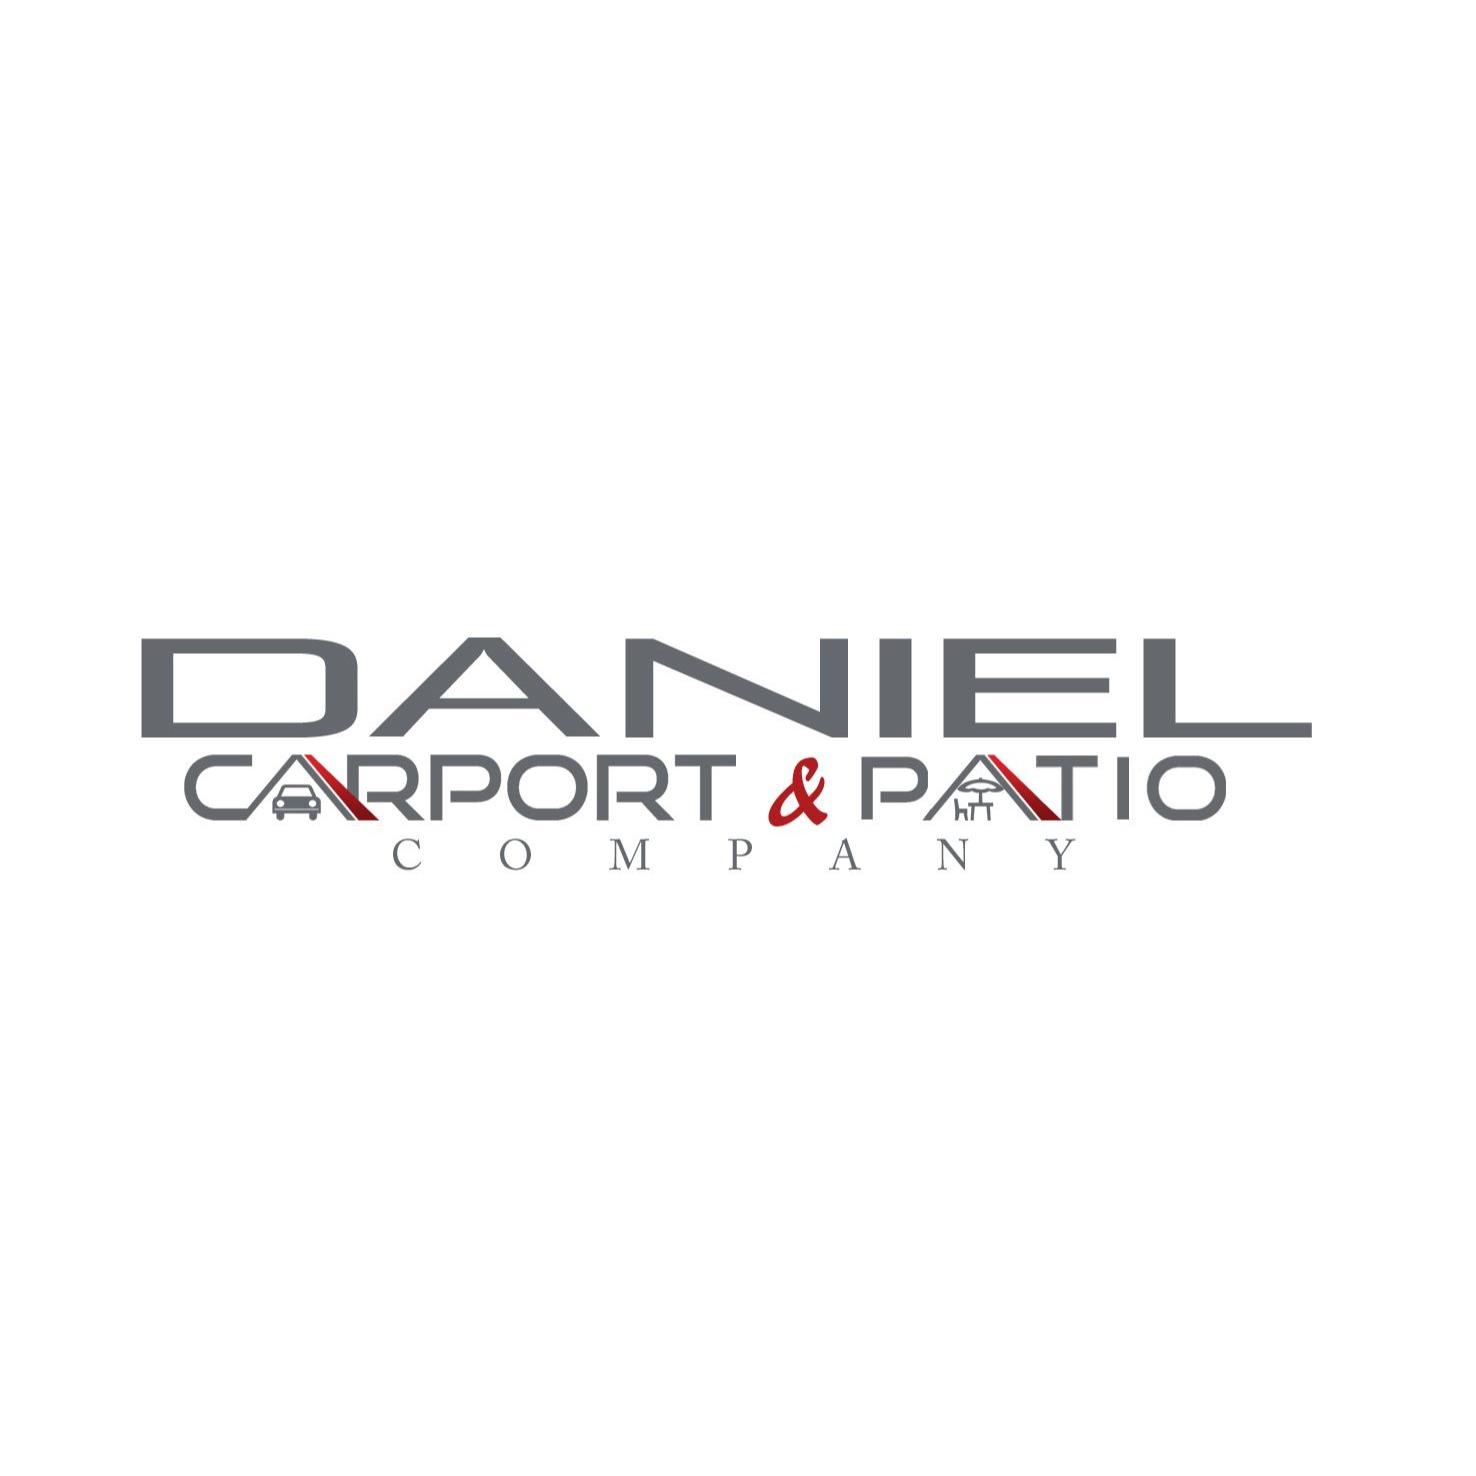 Daniel Carport & Patio Company Logo